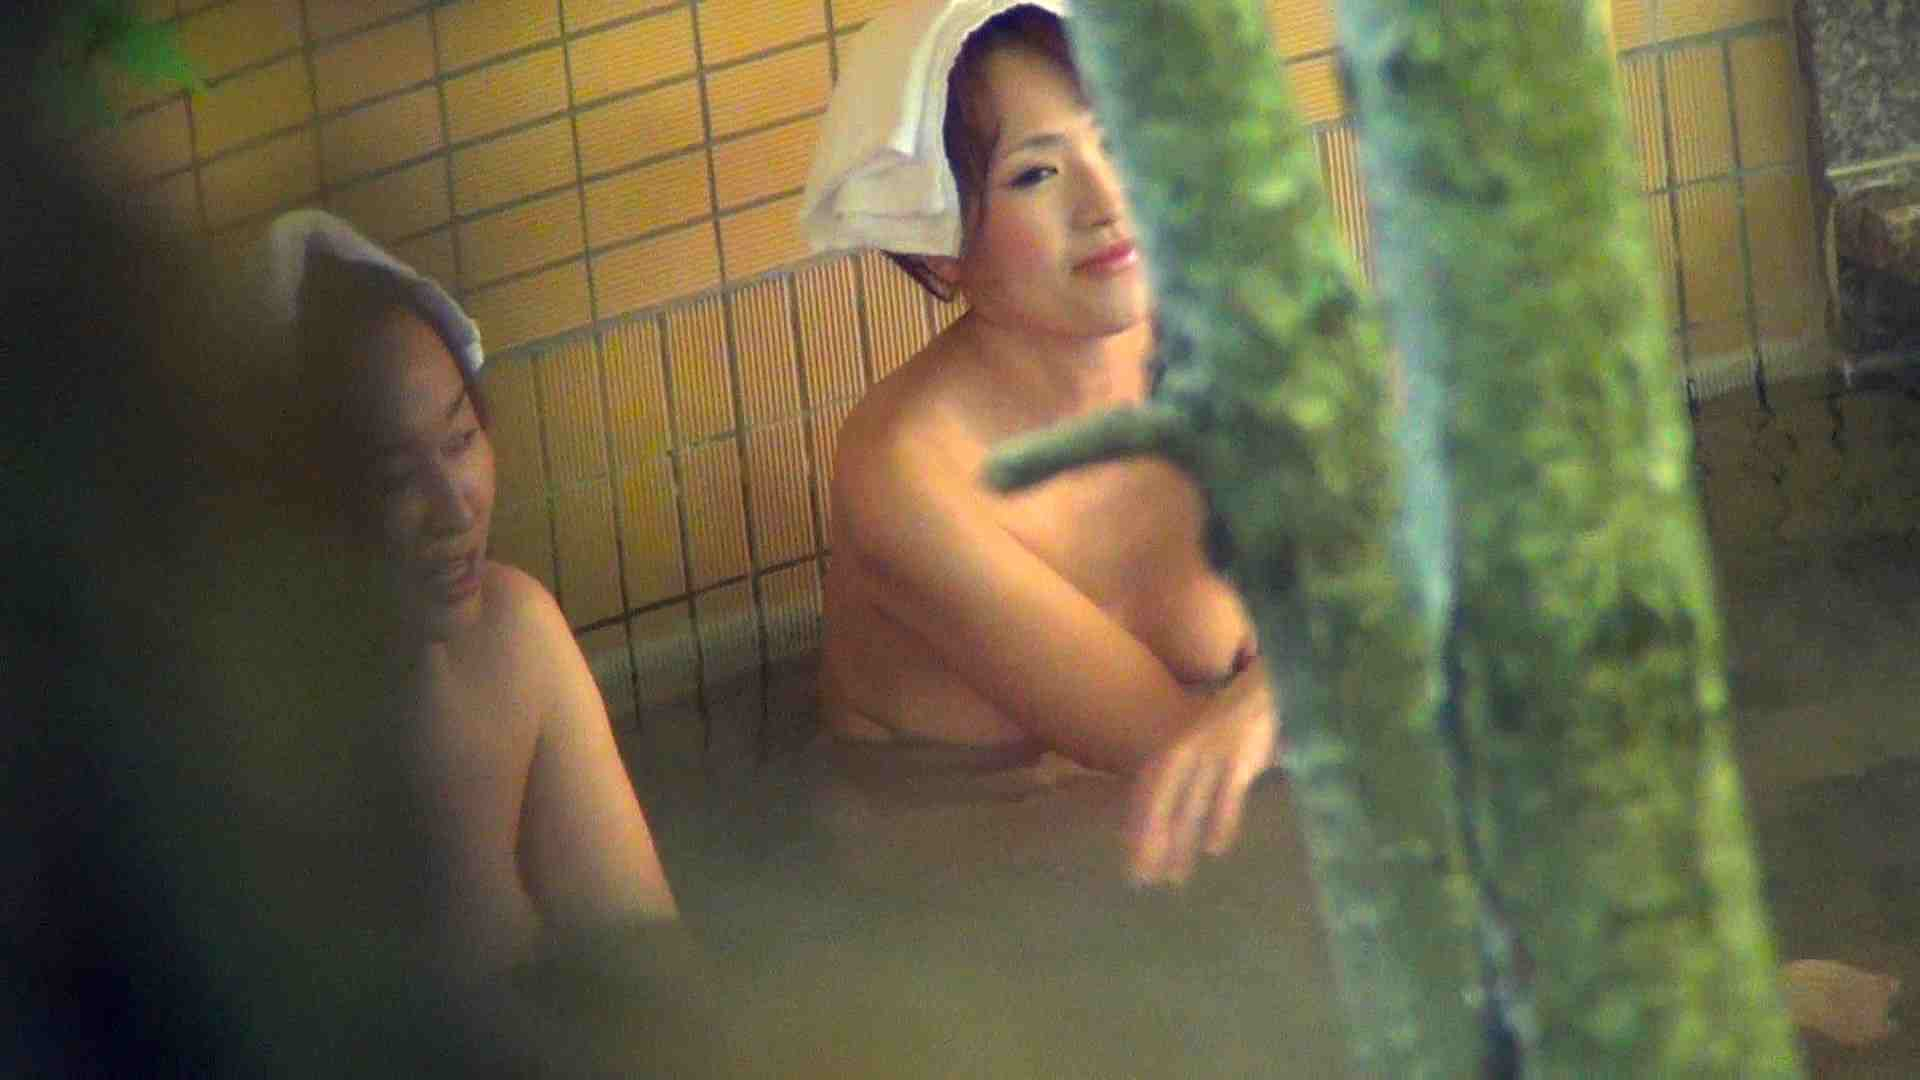 Aquaな露天風呂Vol.272 盗撮シリーズ | 露天風呂編  106PIX 65